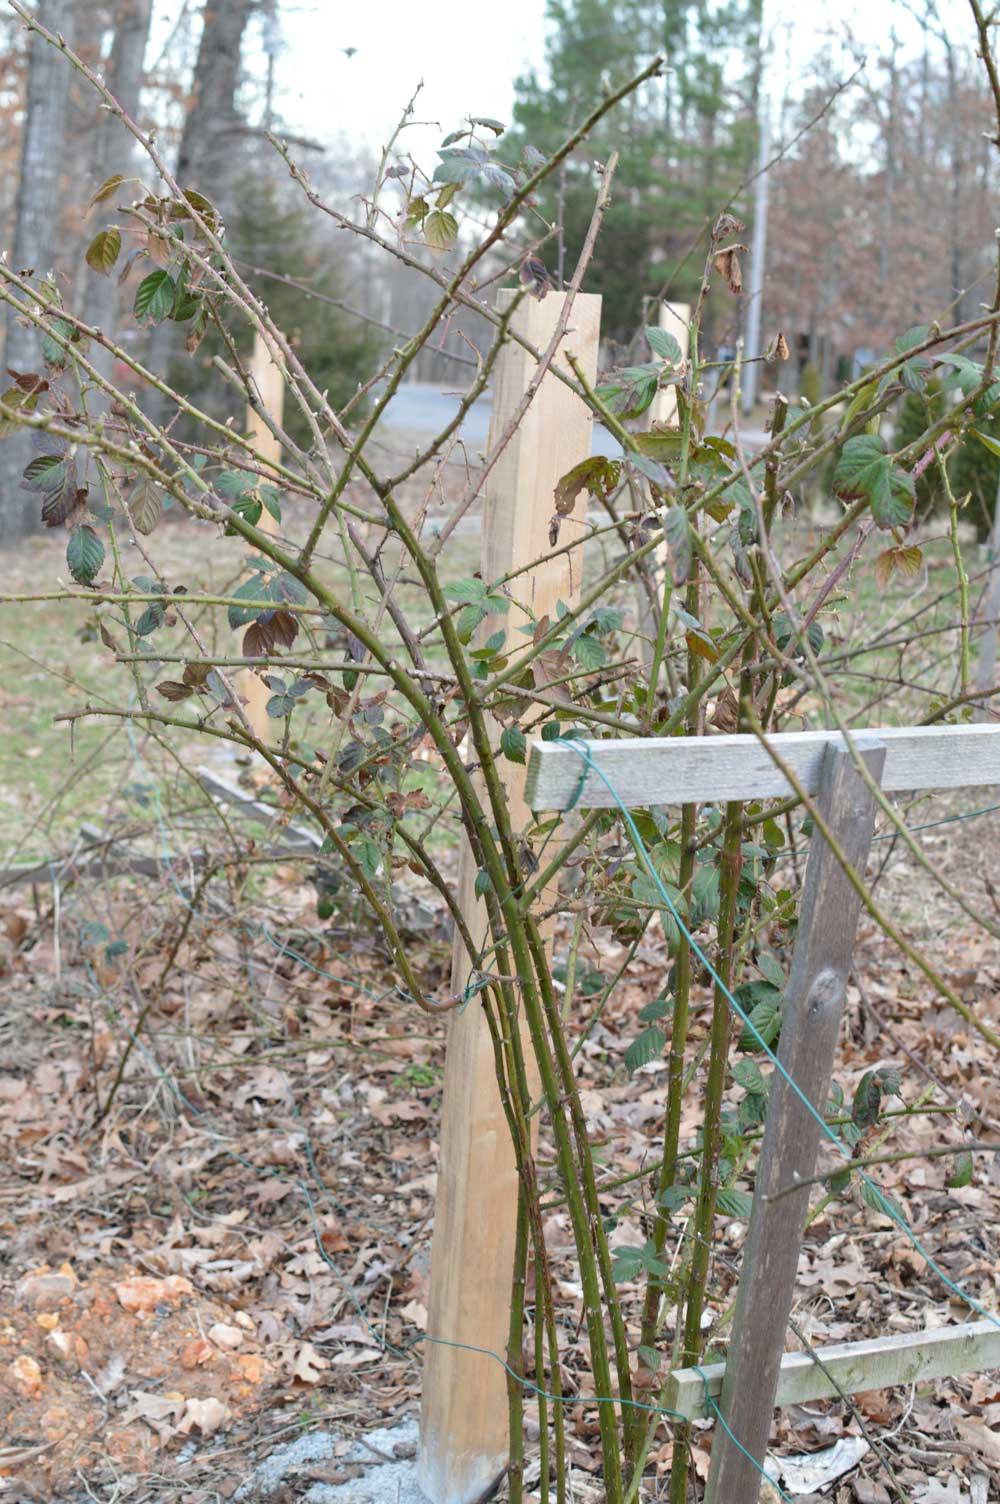 Blackberries-after-pruning-laterals.jpg